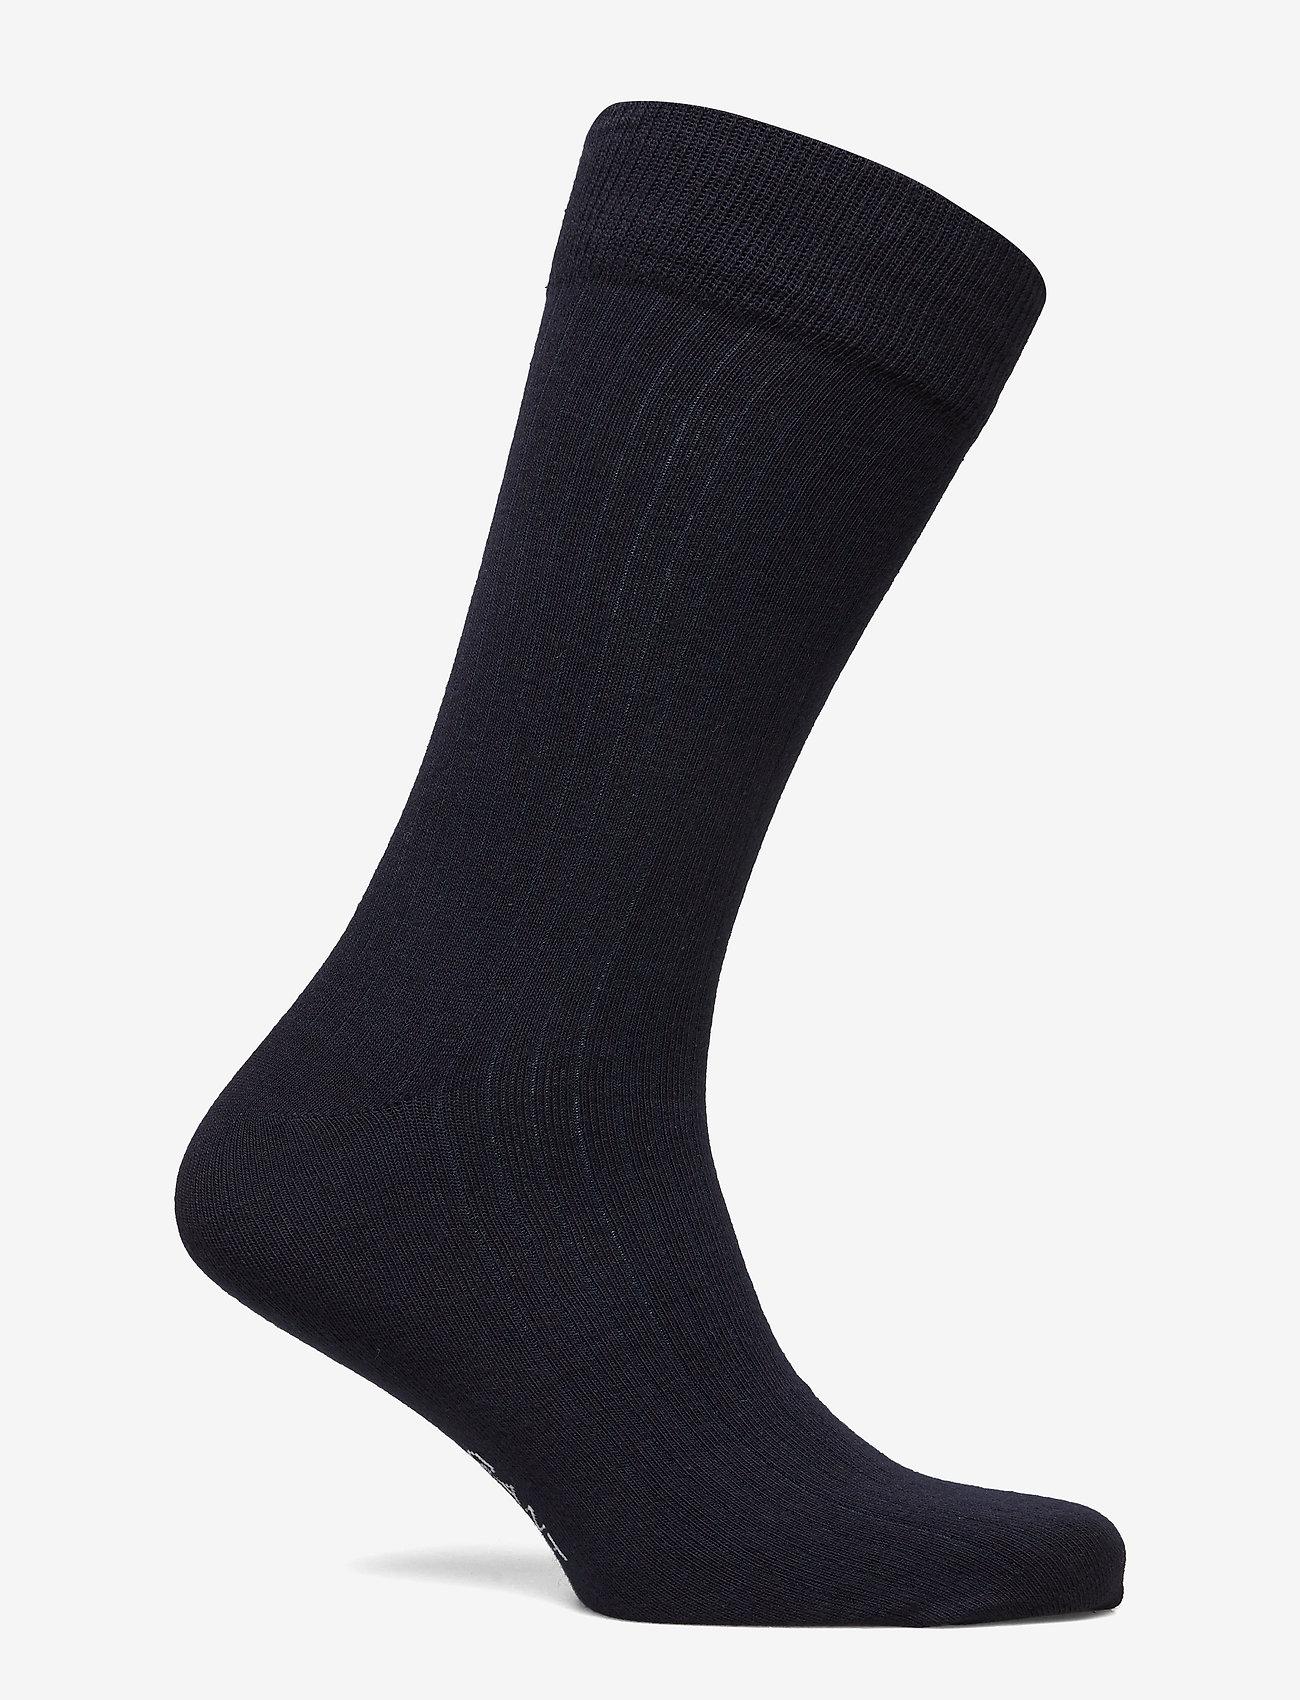 GANT - D1. SOLID RIB SOCK EMB SOCKS - chaussettes régulières - marine - 1